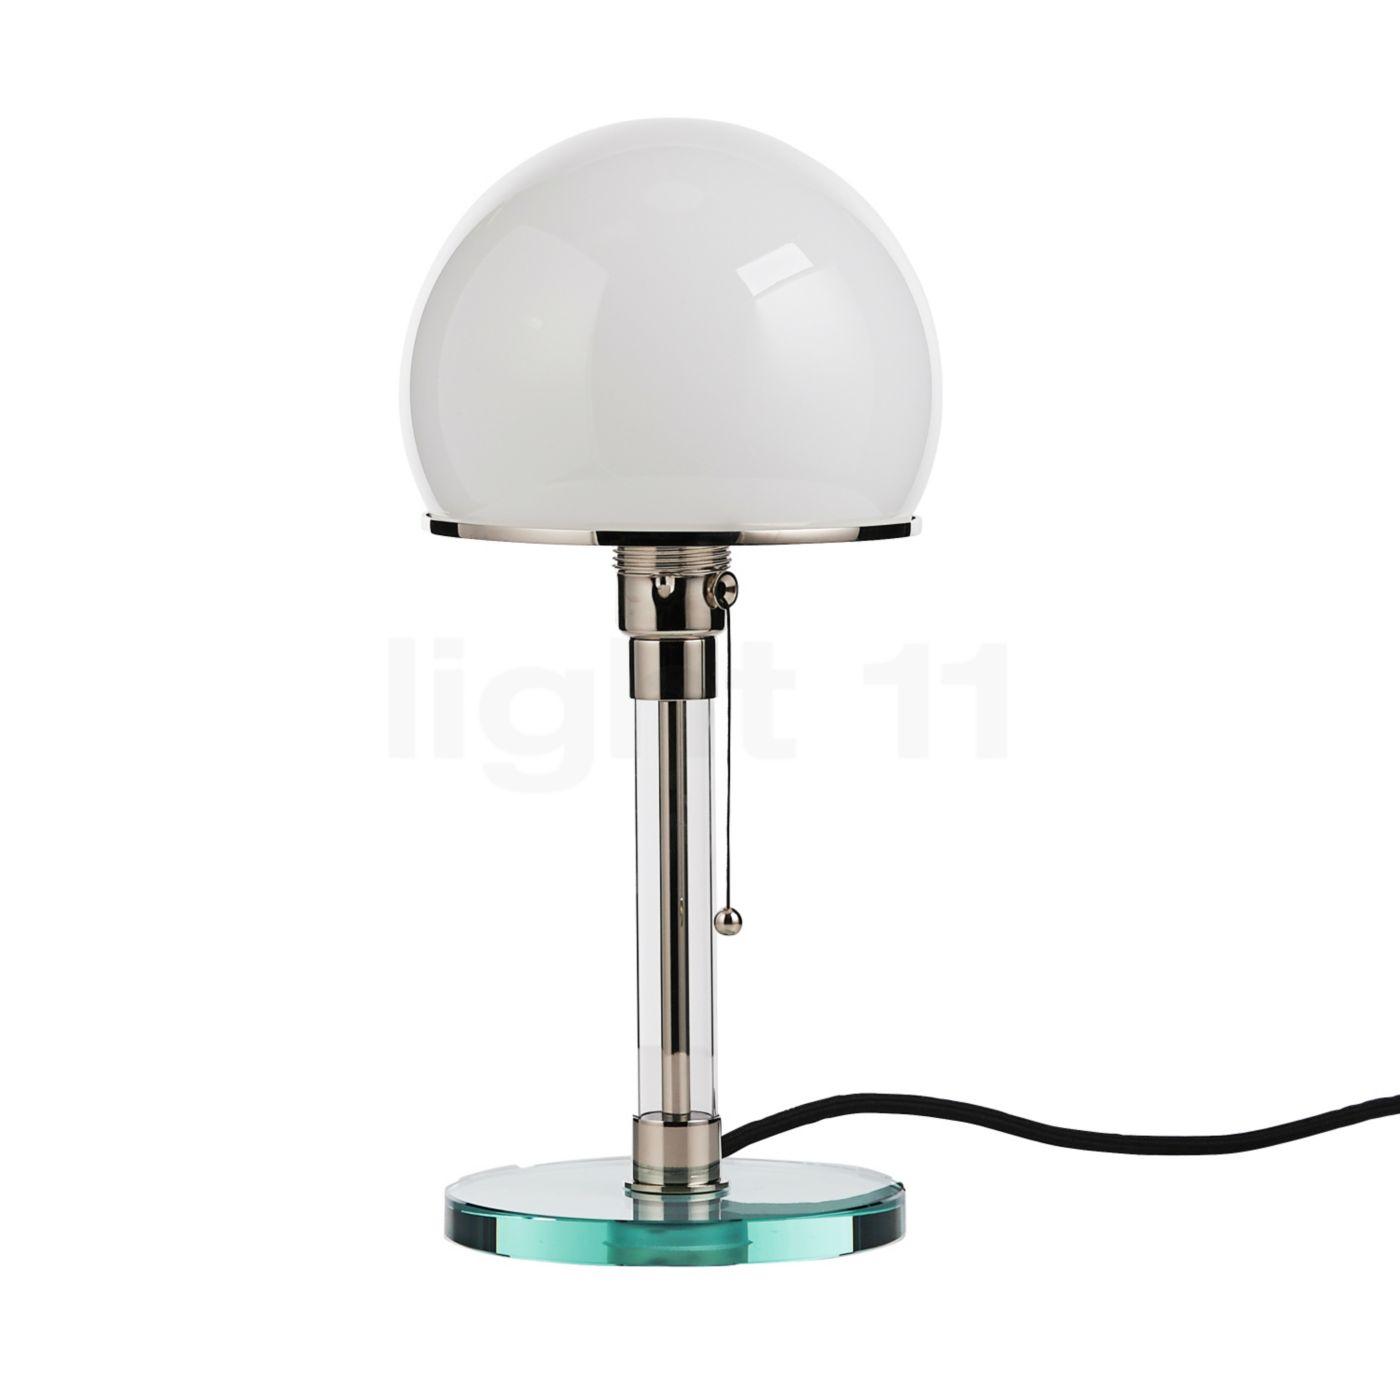 Tecnolumen Wagenfeld WG 24 Lampada da tavolo Lampada da comodino